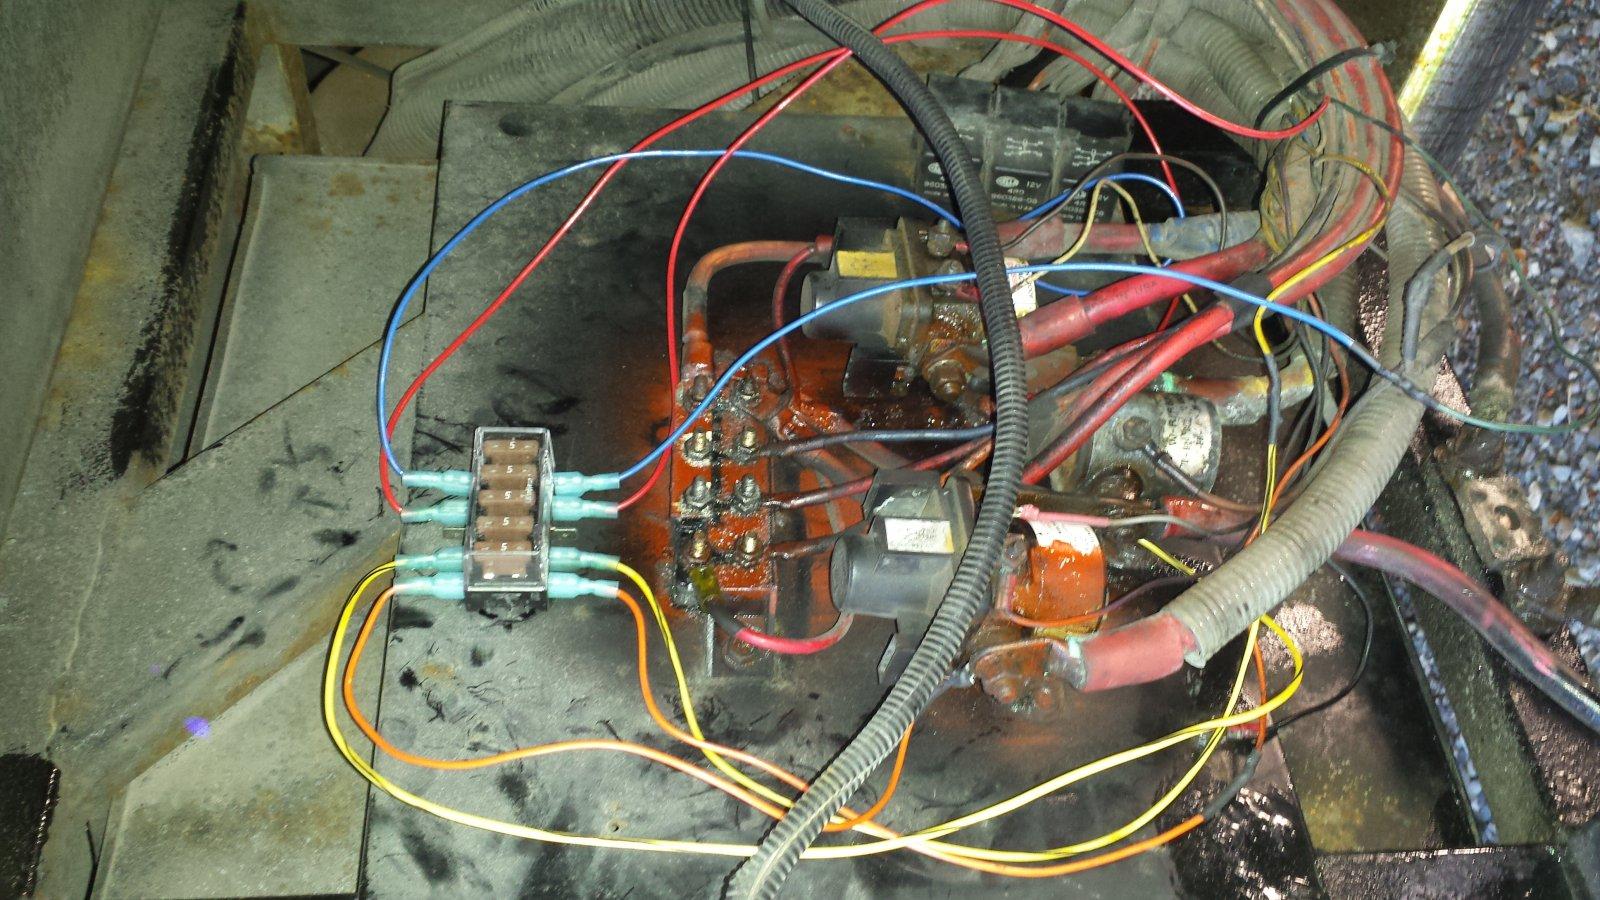 Coachmen 2000 SportsCoach Battery Disconnect Wiring - iRV2 ForumsiRV2 Forums